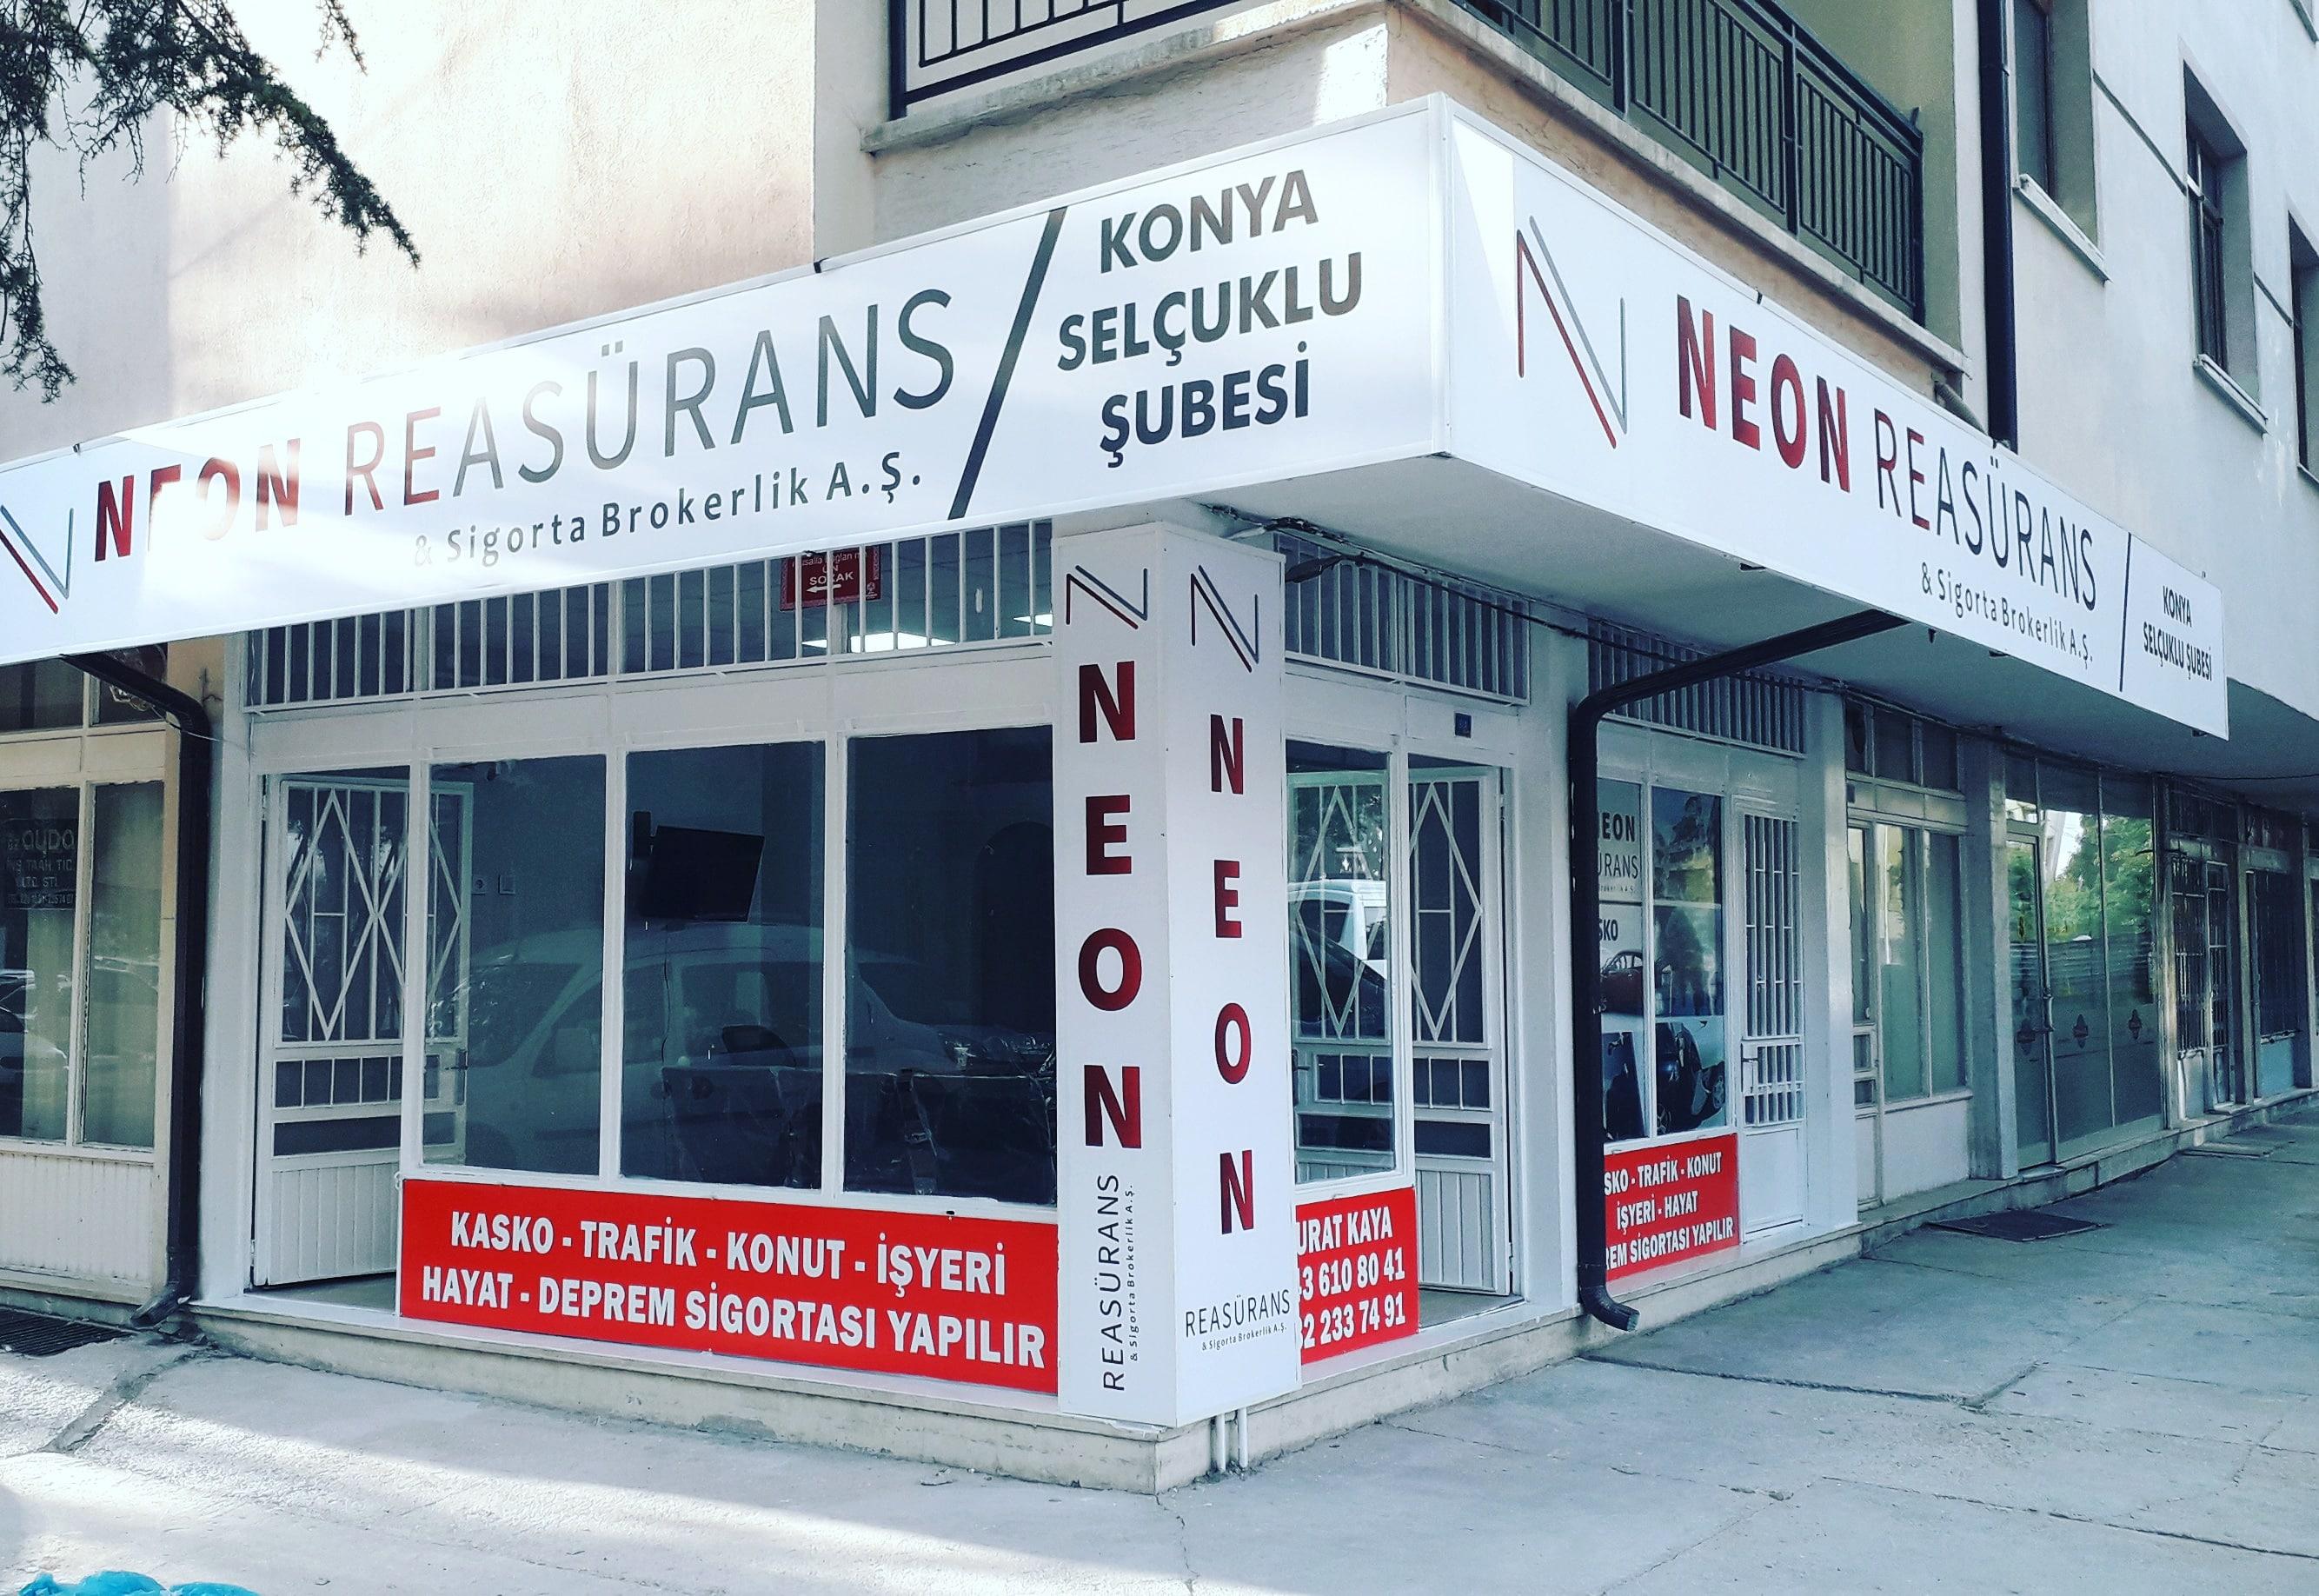 Neon Reasürans & Sigorta Brokerlik A.ş